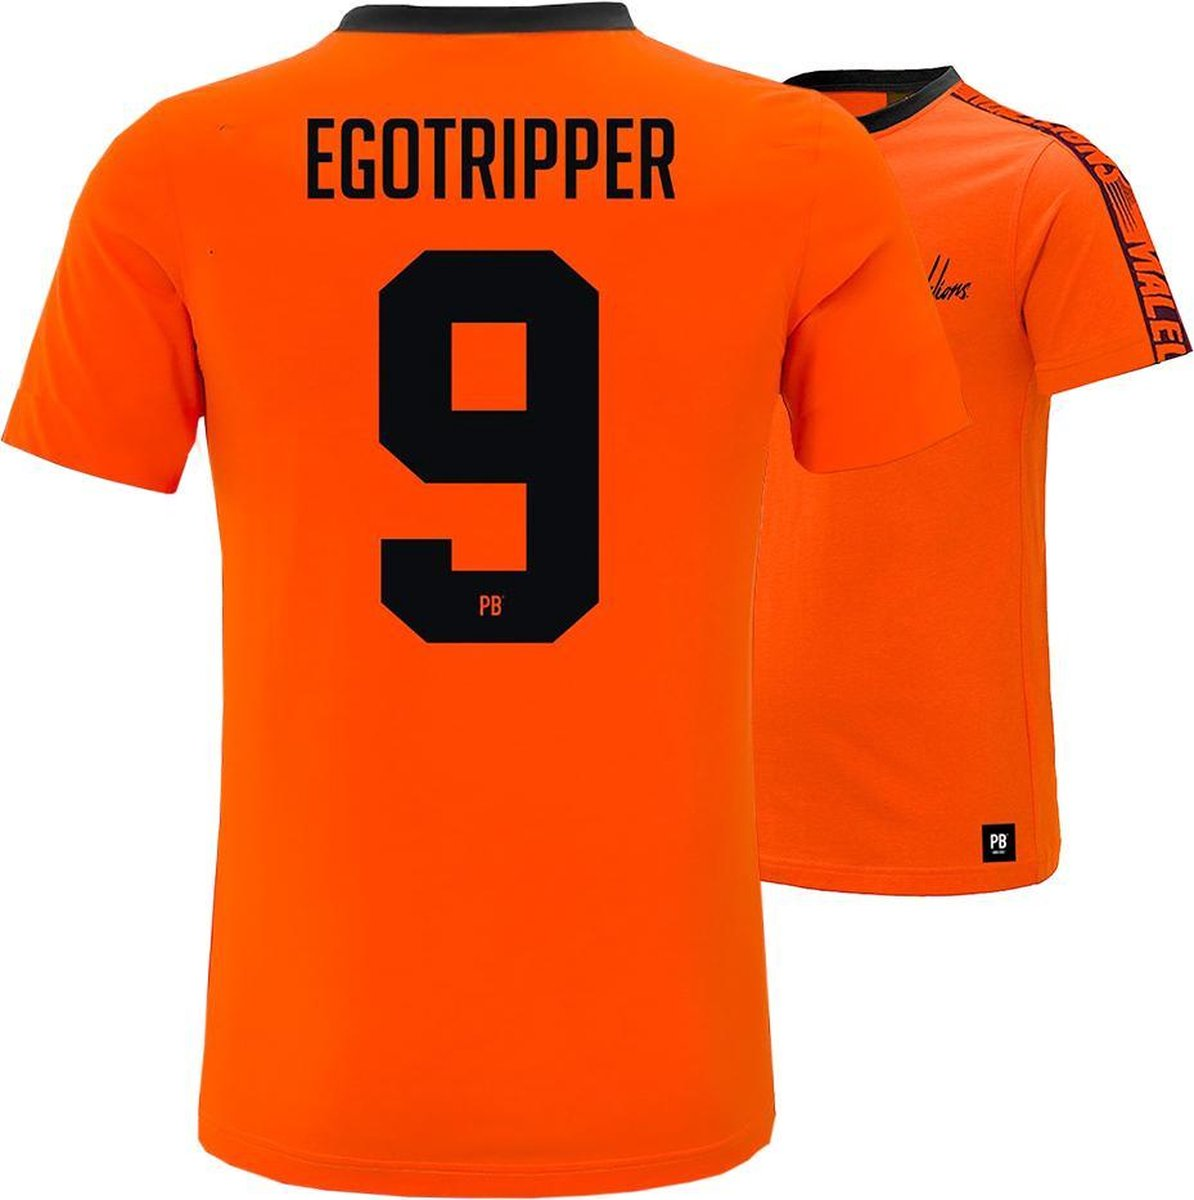 PB x Malelions - 9. Egotripper   Maat S   Oranje T-shirt   EK voetbal 2021   Heren en dames